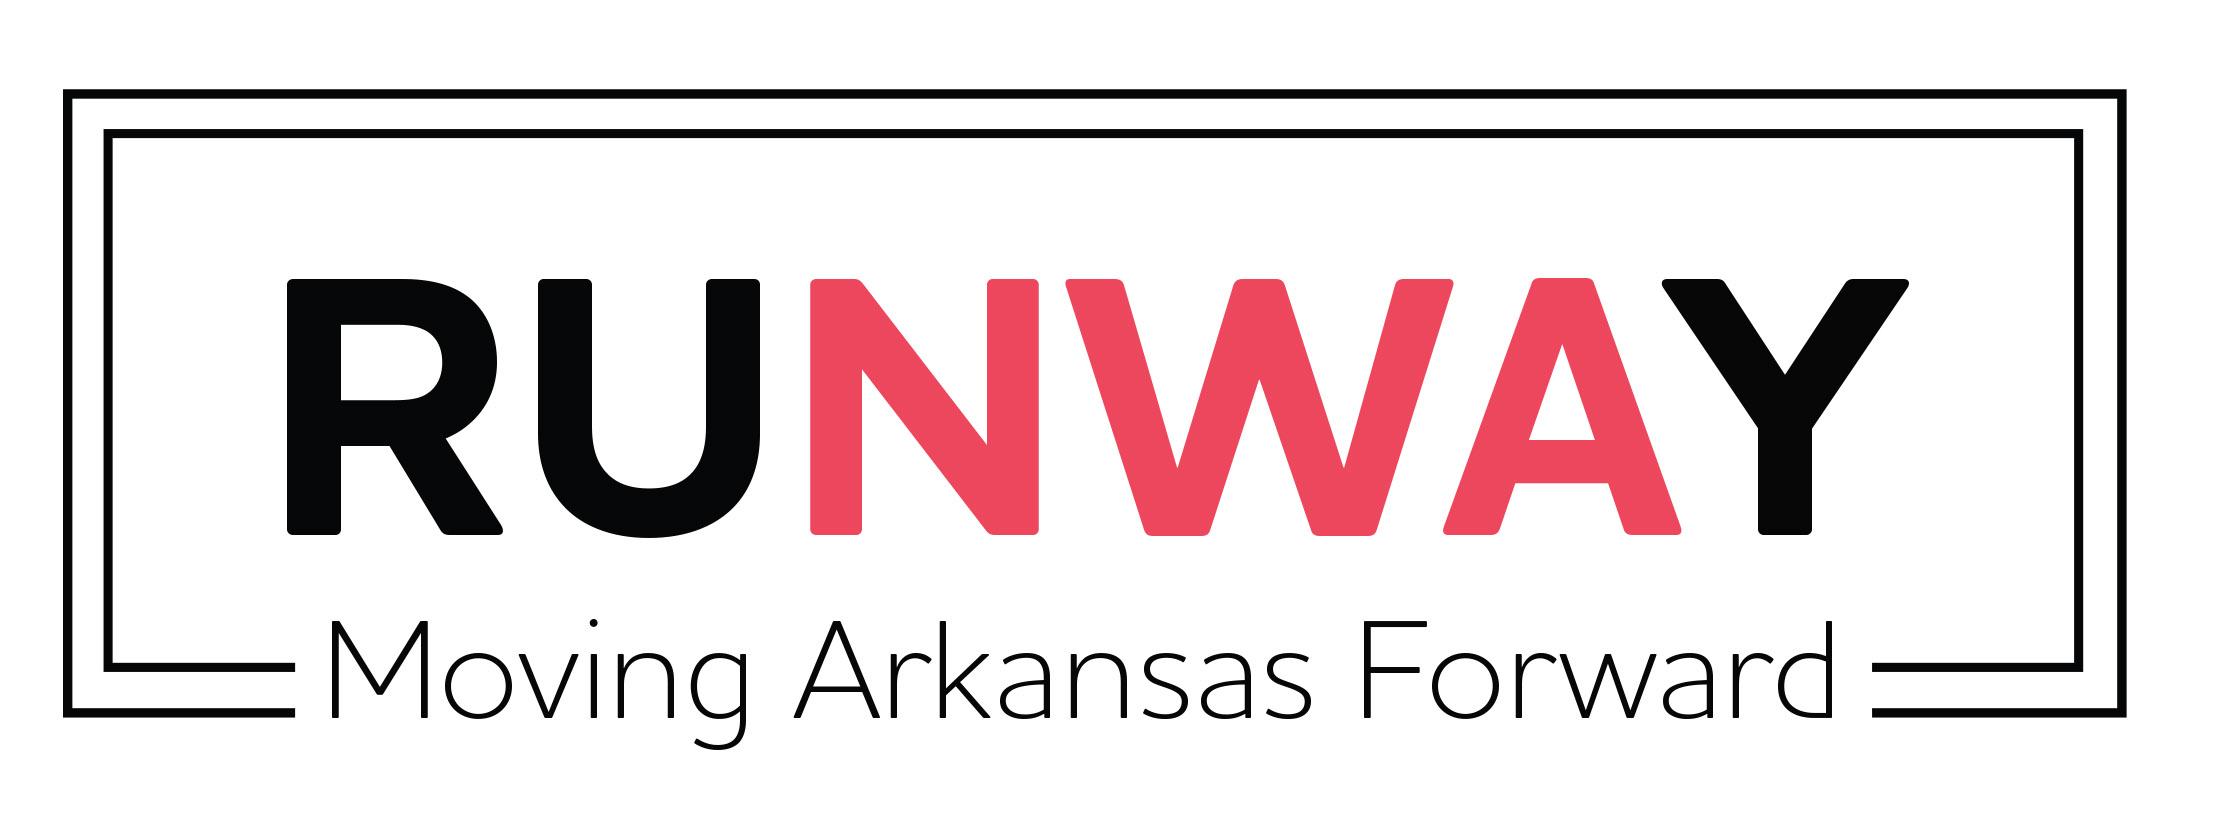 Runway Group logo